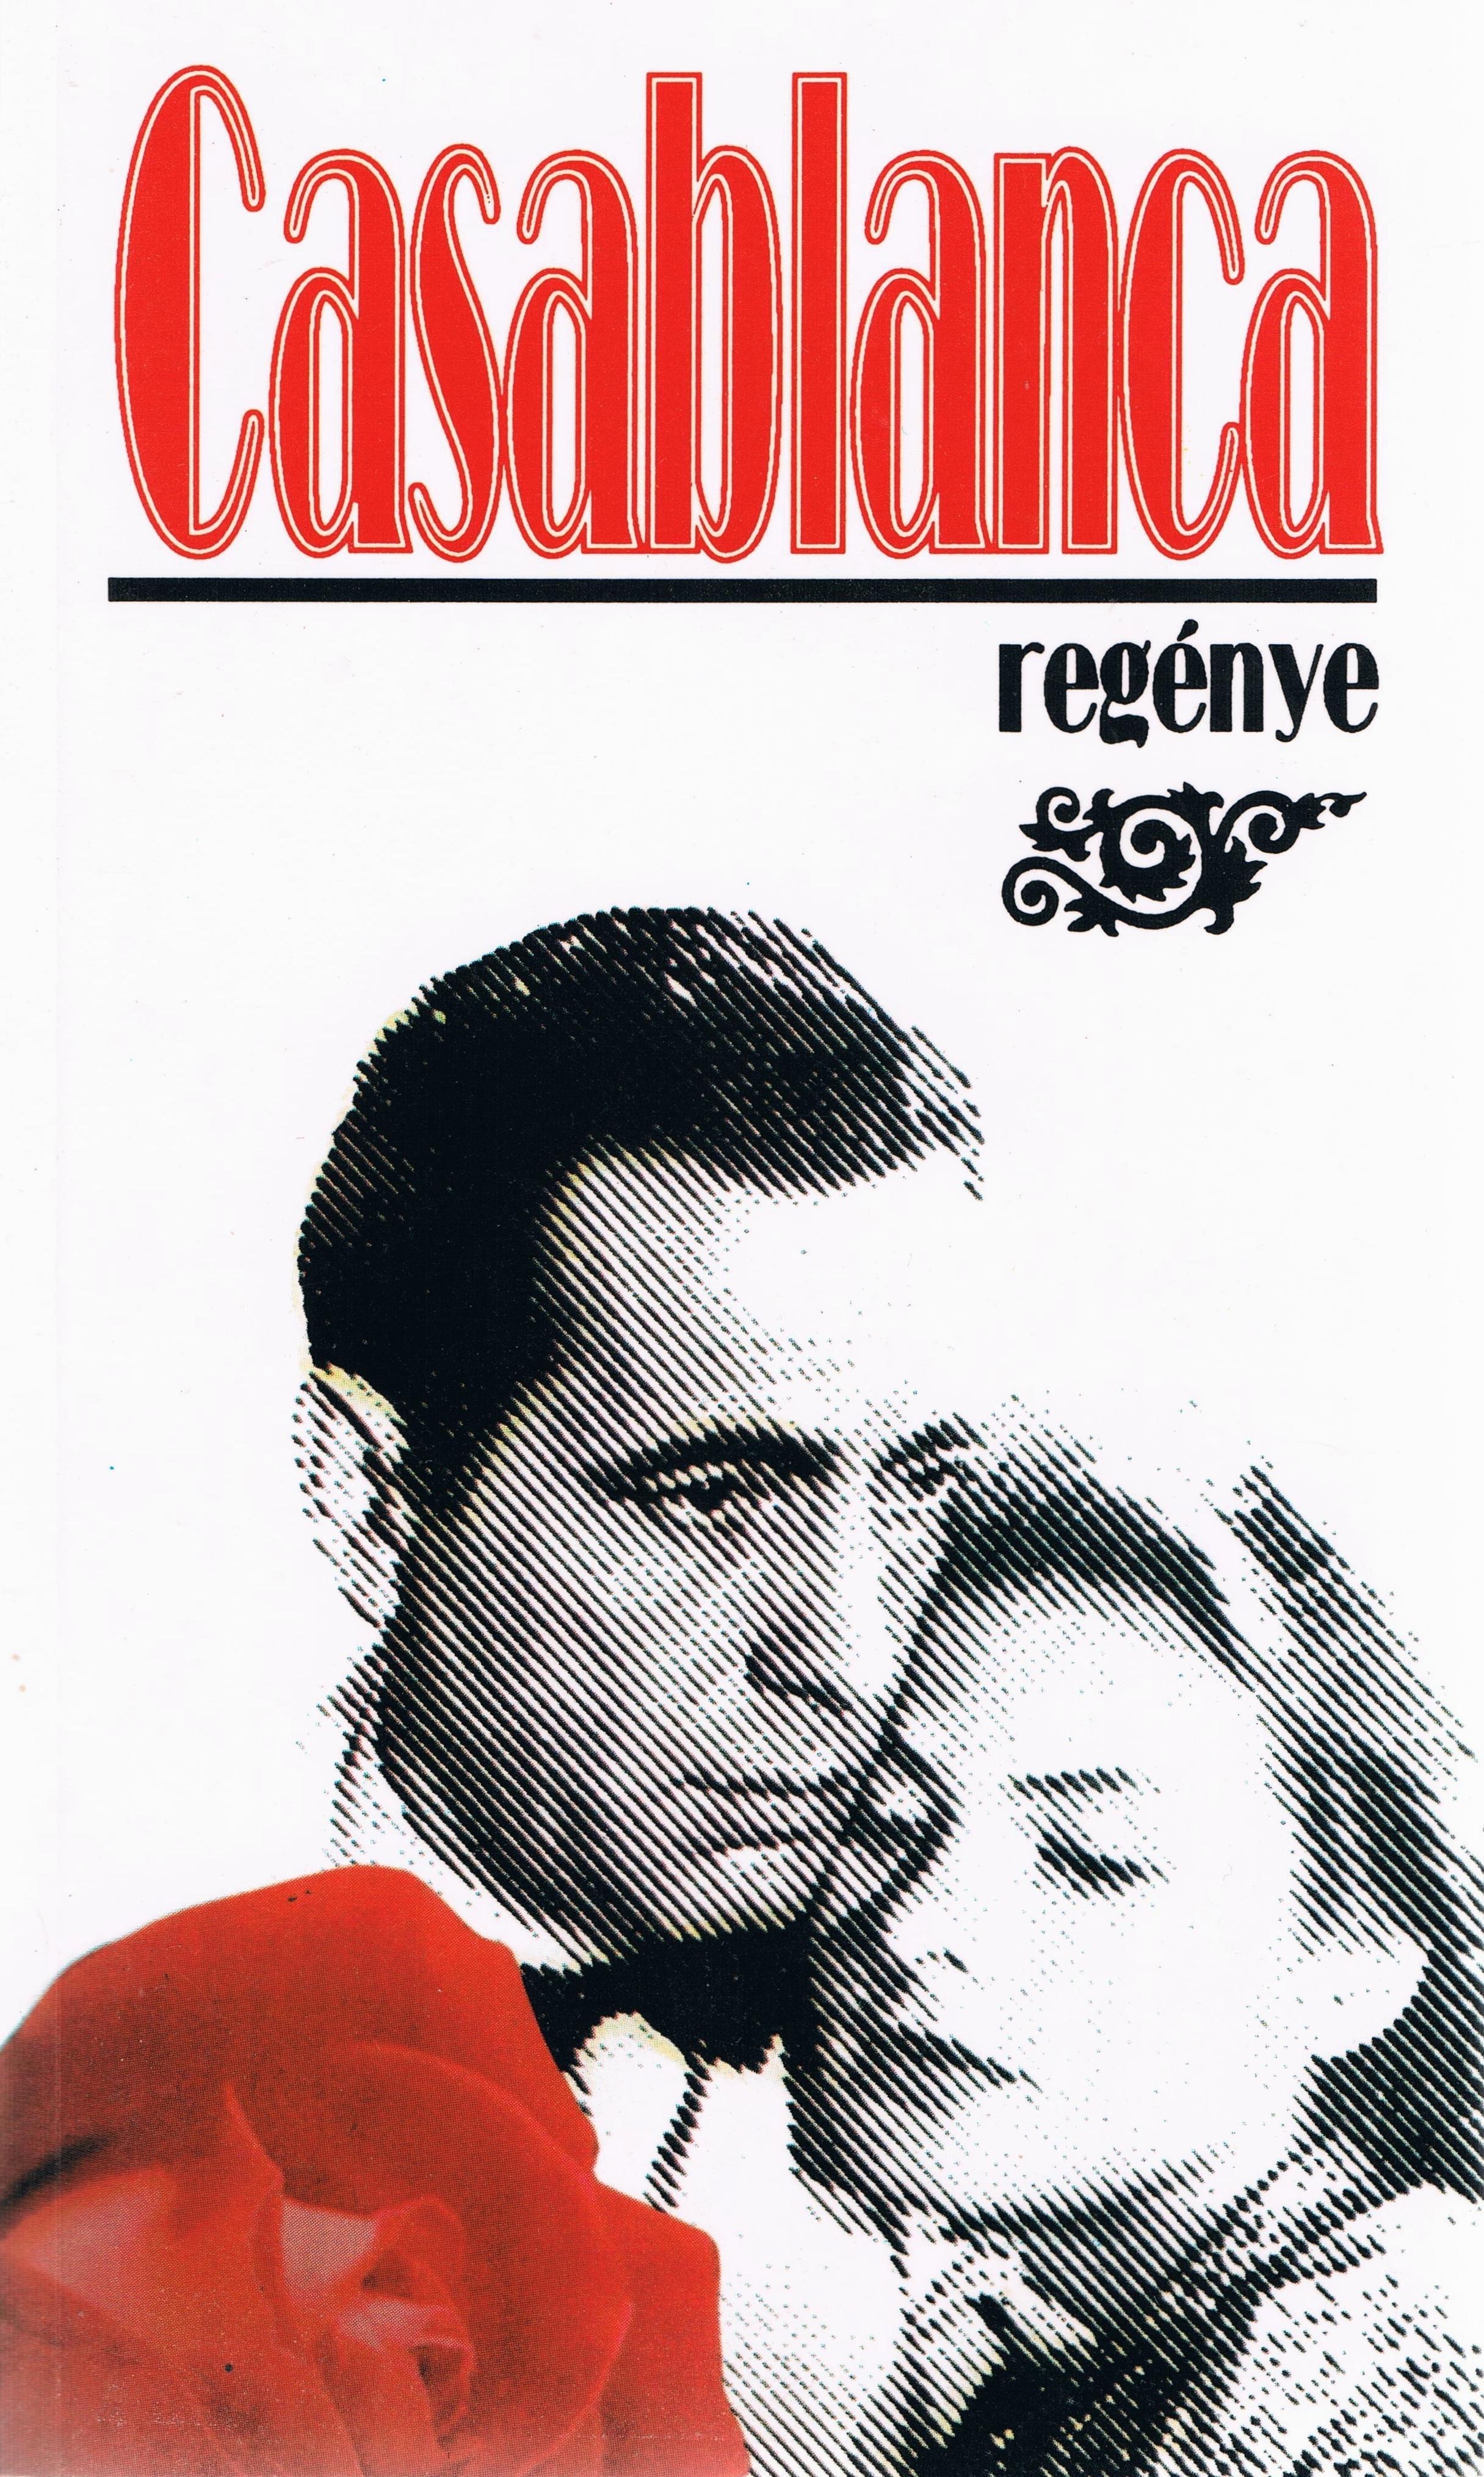 Casablanca - Magyar Transcript   Readable